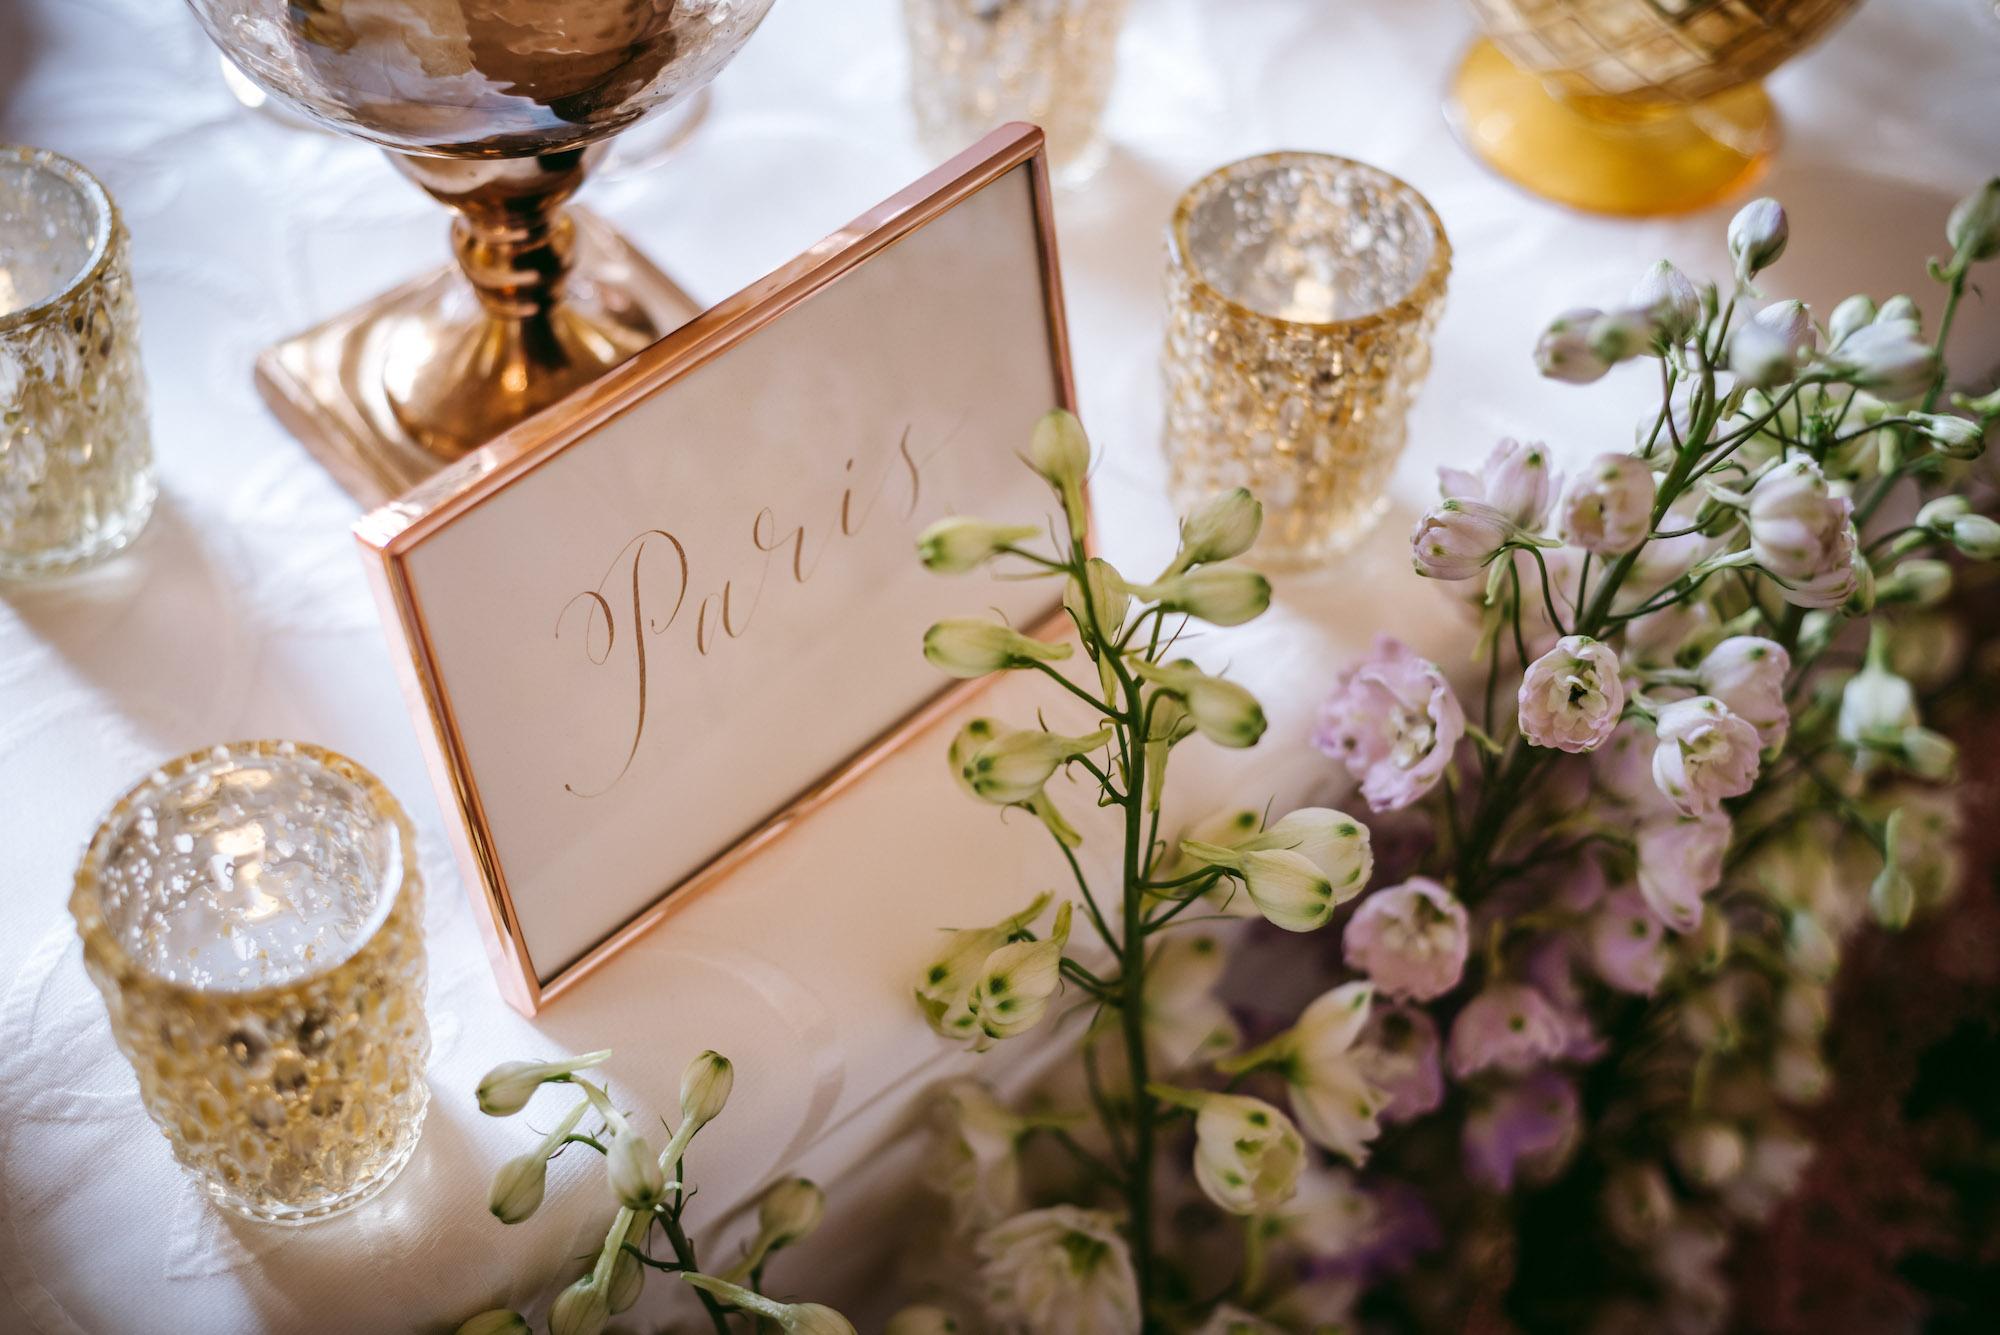 66d   Hengrave Hall Wedding   Suffolk Wedding   Lamare London   Luxury Wedding Planner   Jon Mold Photography.jpg